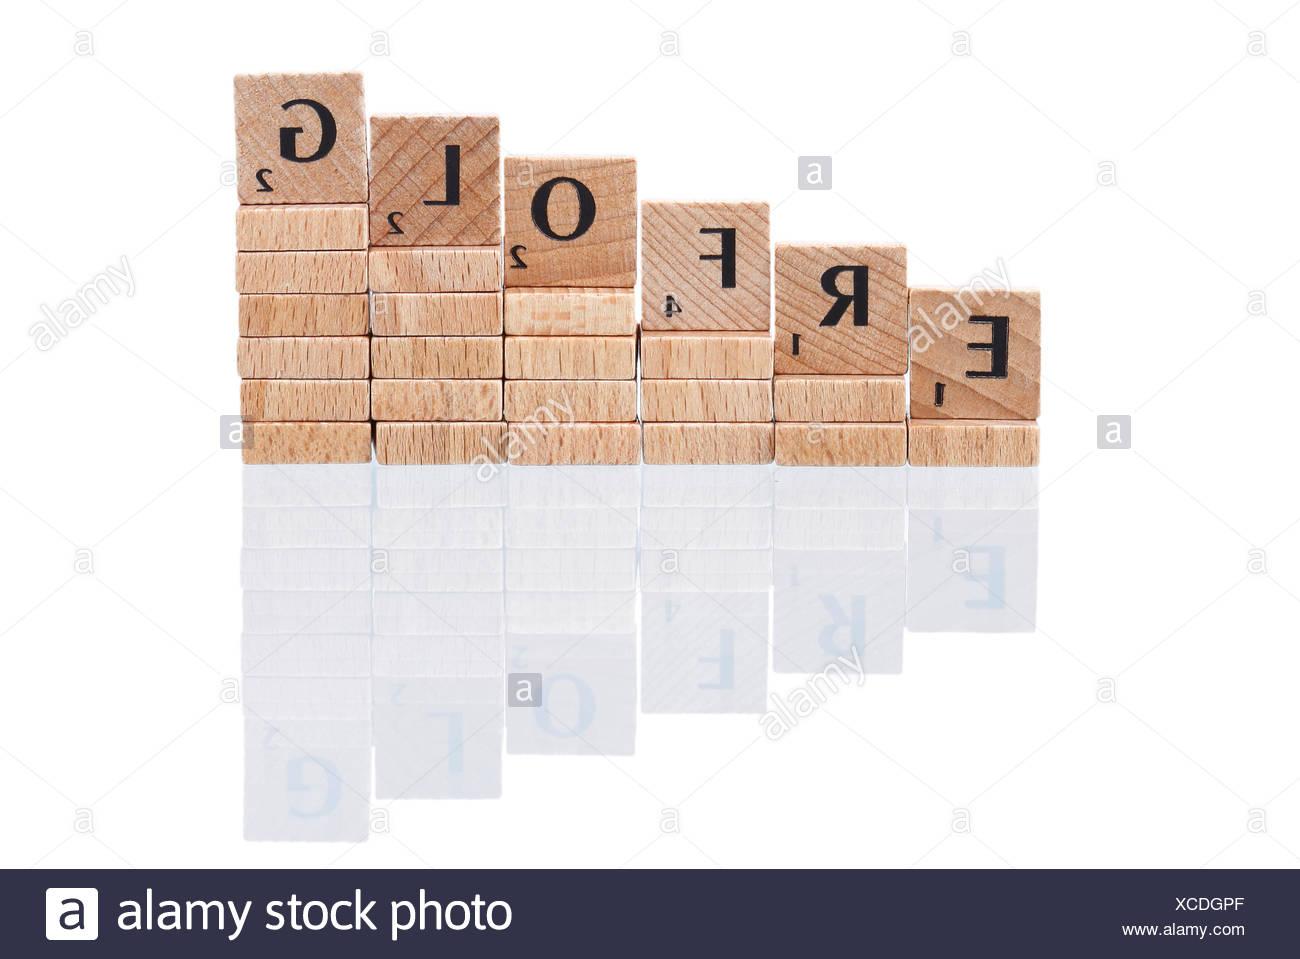 achievement ascent determined - Stock Image